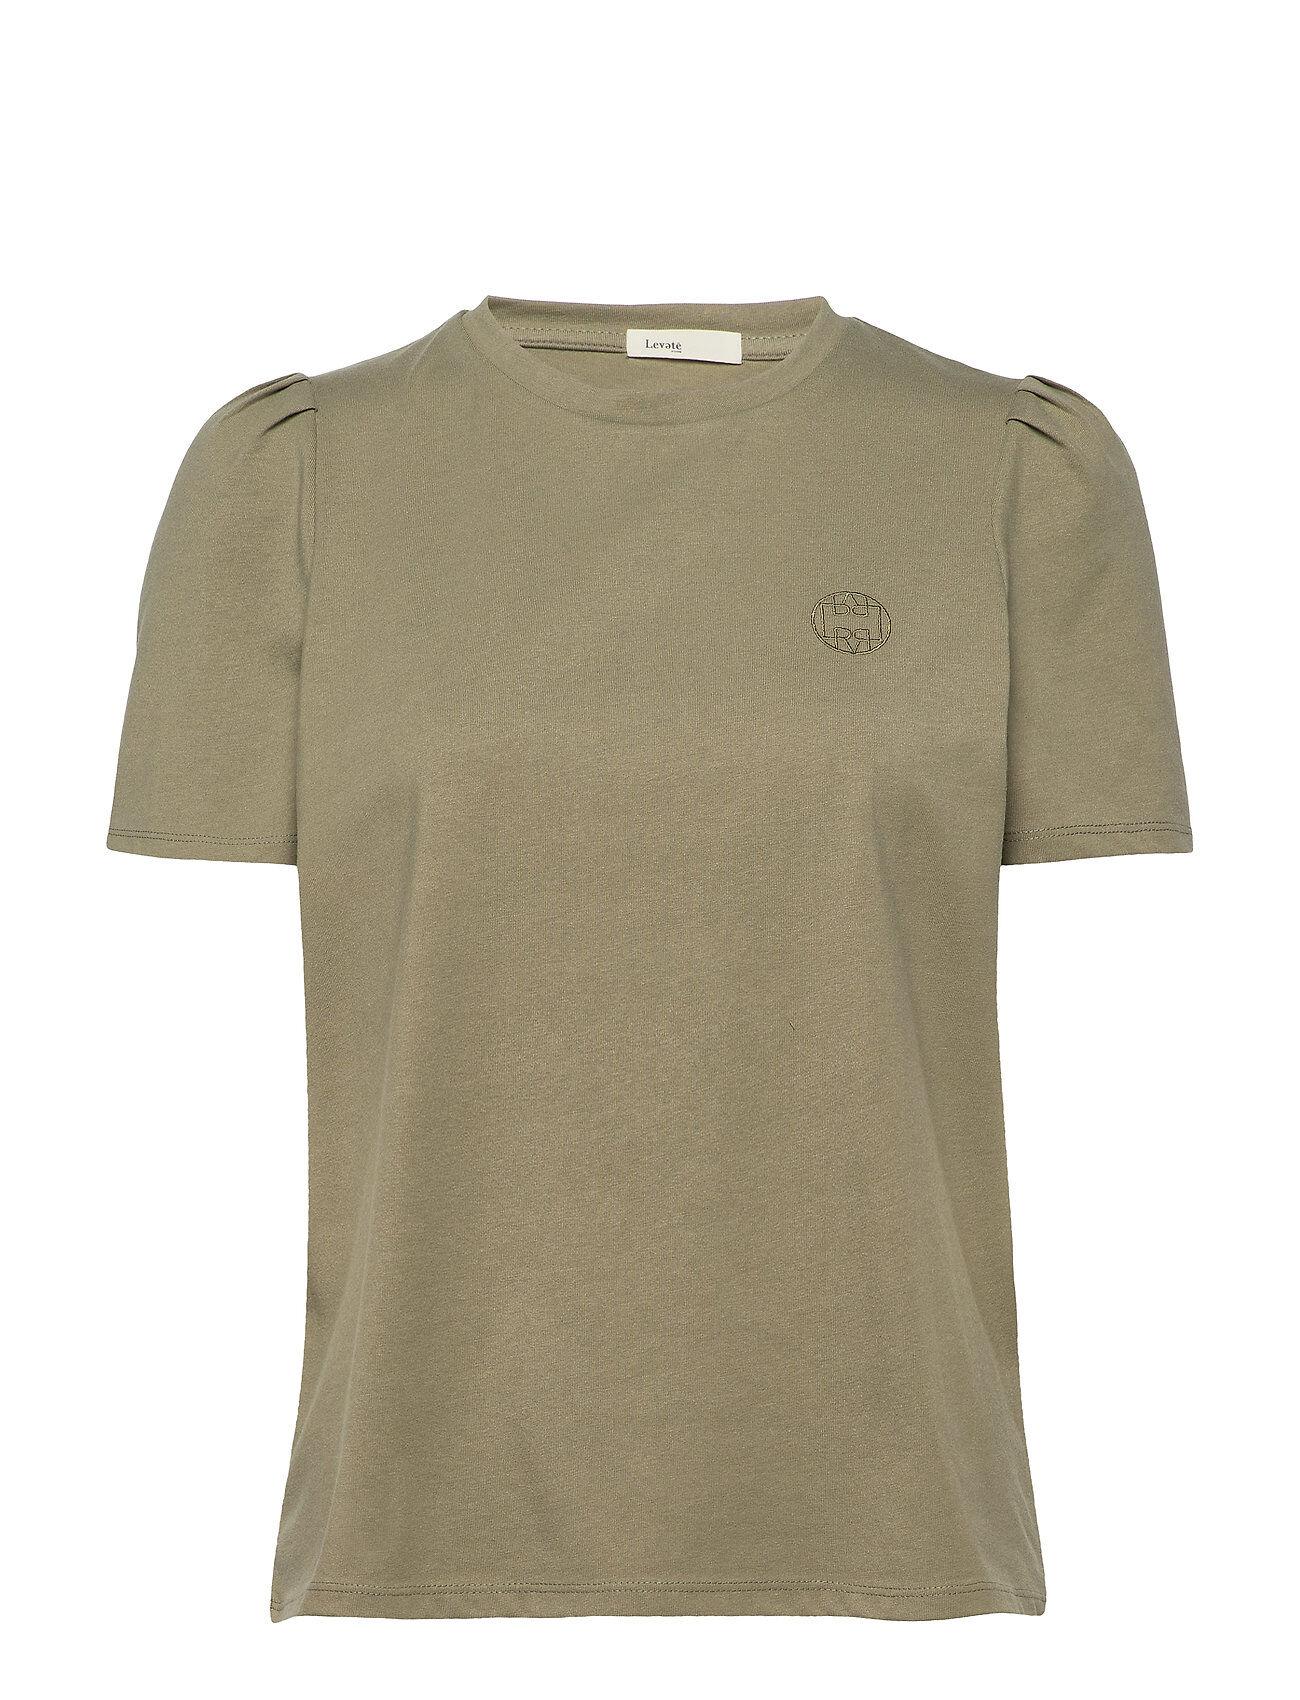 Levete Room Lr-Isol T-shirts & Tops Short-sleeved Vihreä Levete Room